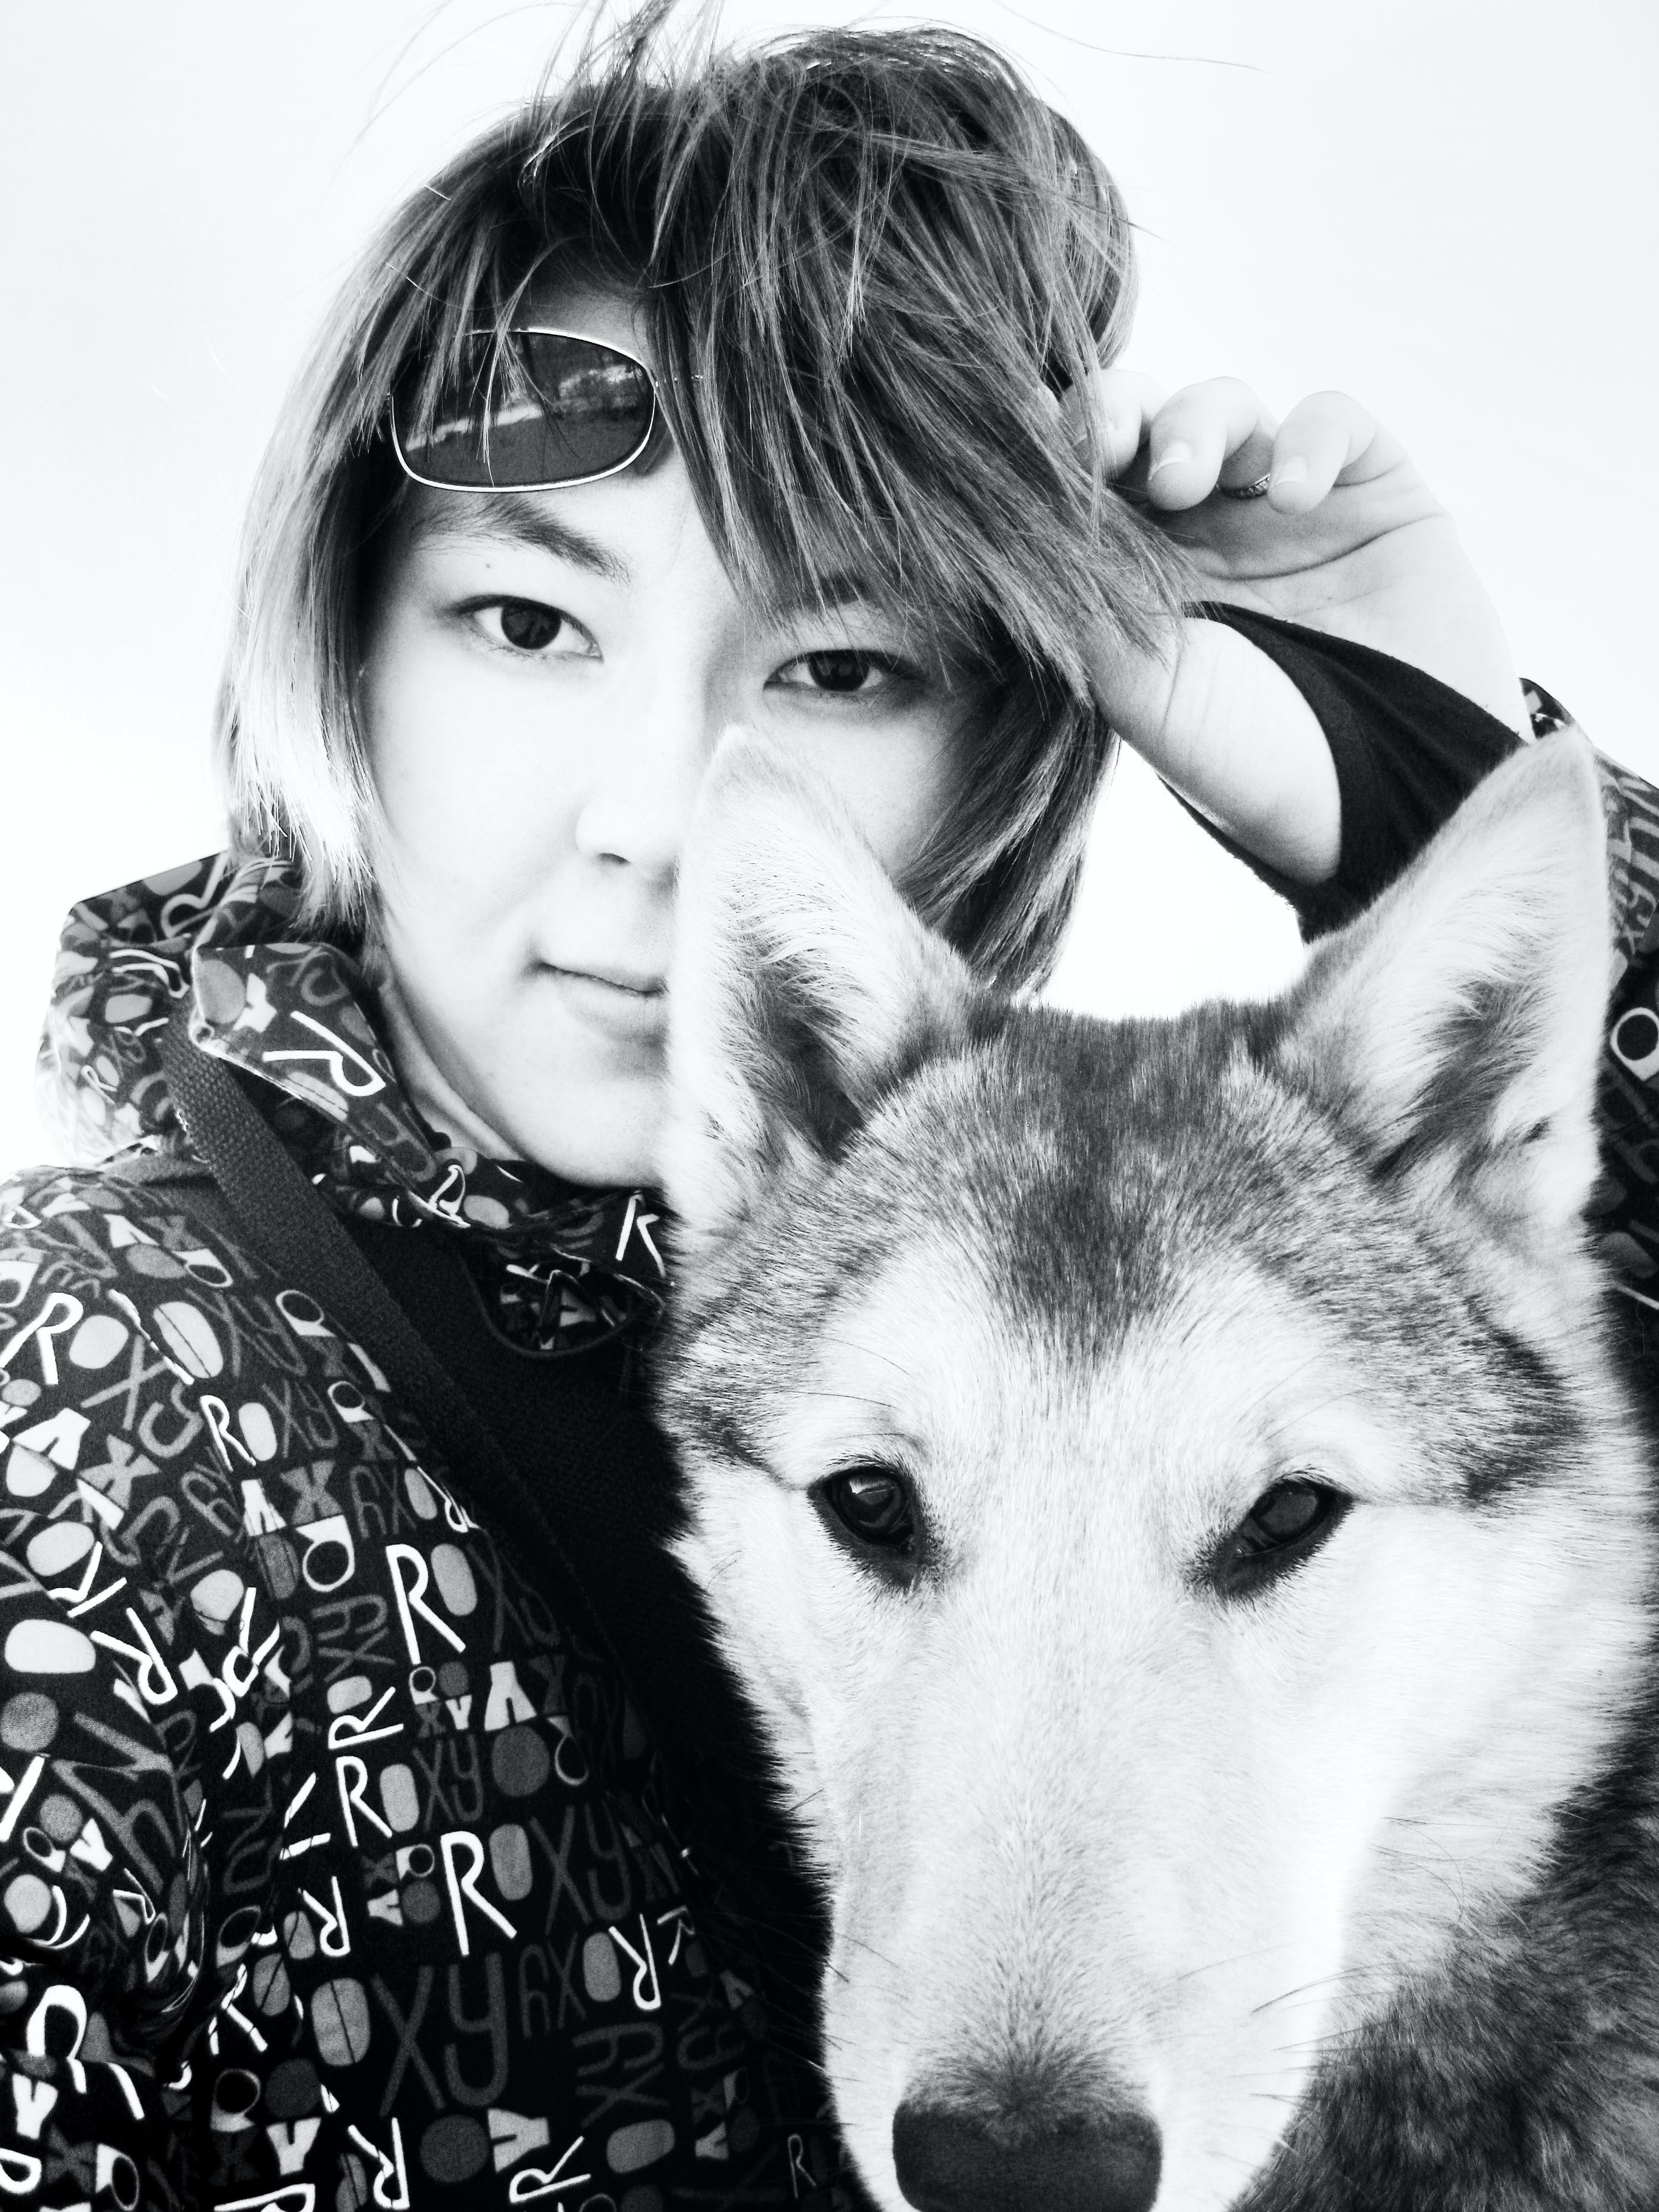 Free stock photo of girl, winter, dog, Asian